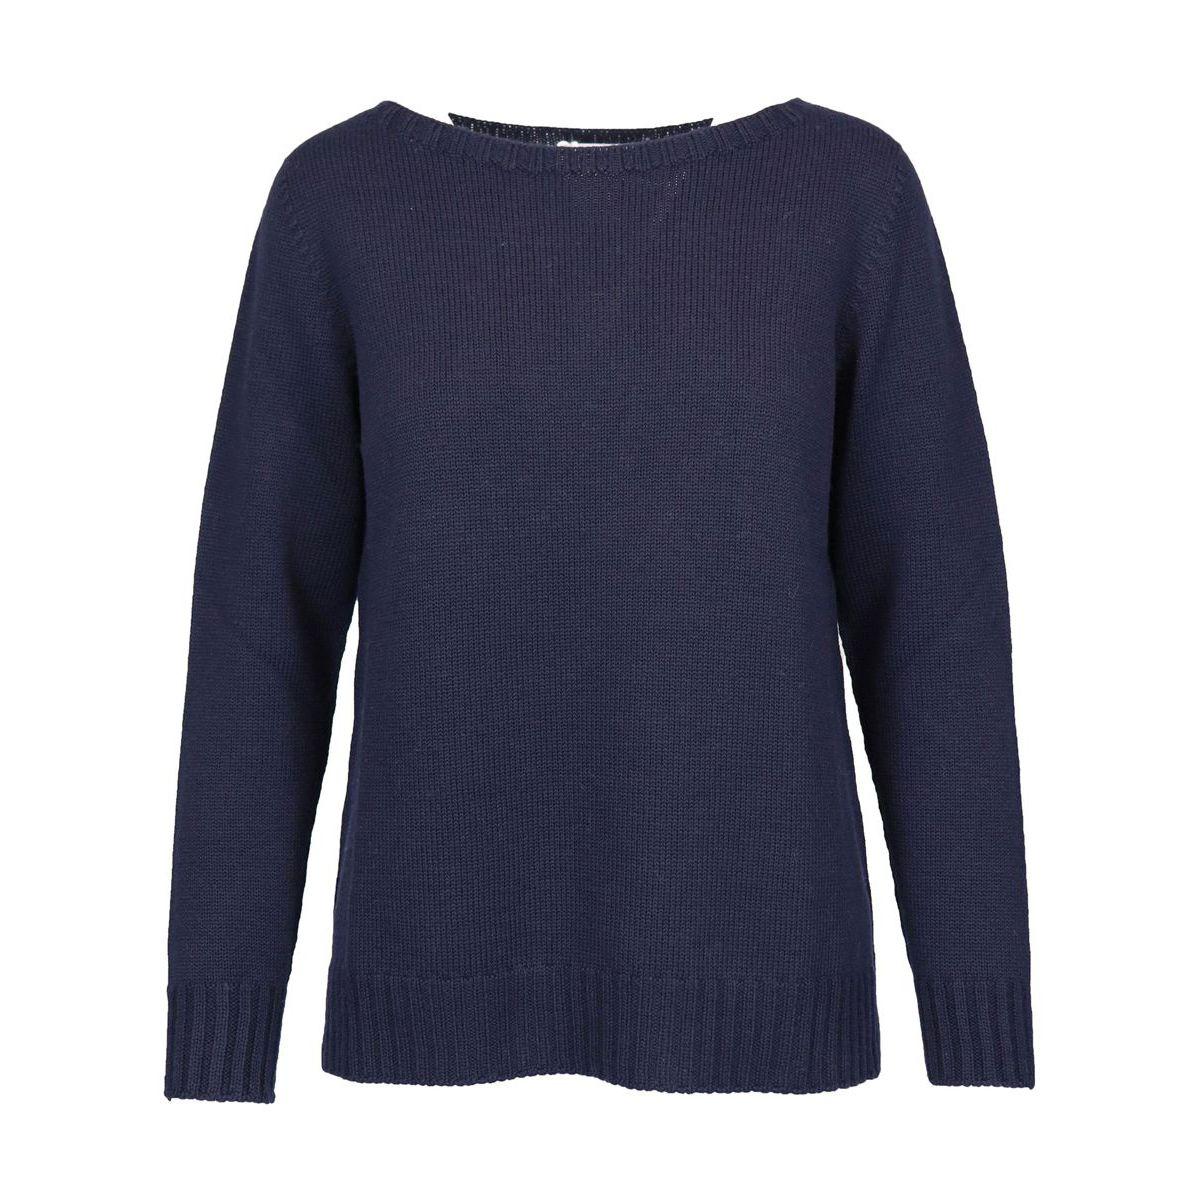 Sweater in shaved marinara virgin wool Navy Gran Sasso